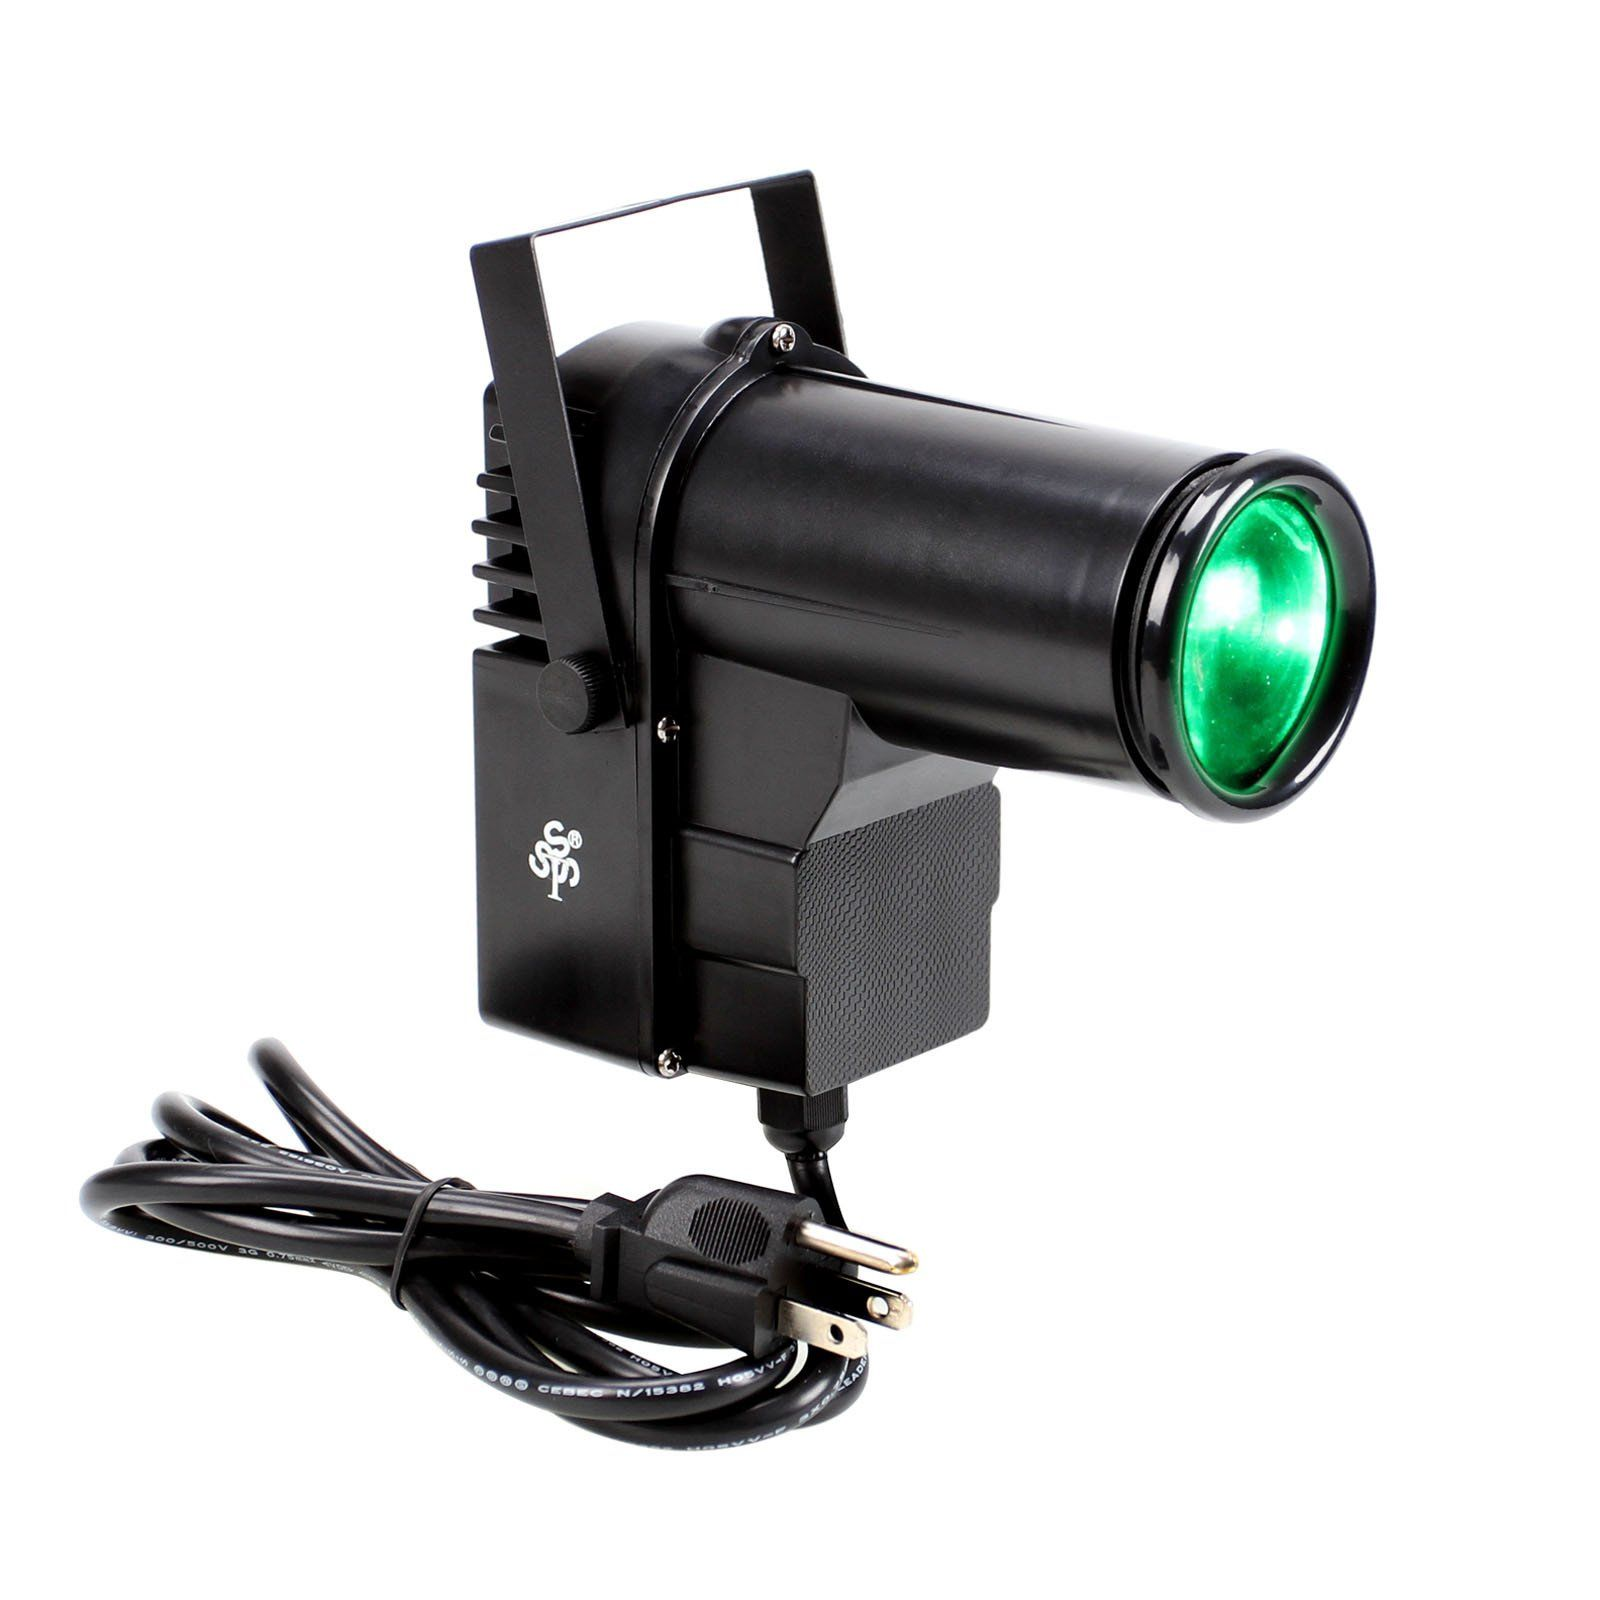 Amazon.com: TSSS XL99 10-Watt RGBW LED Spotlight with Mount Pinspot ...